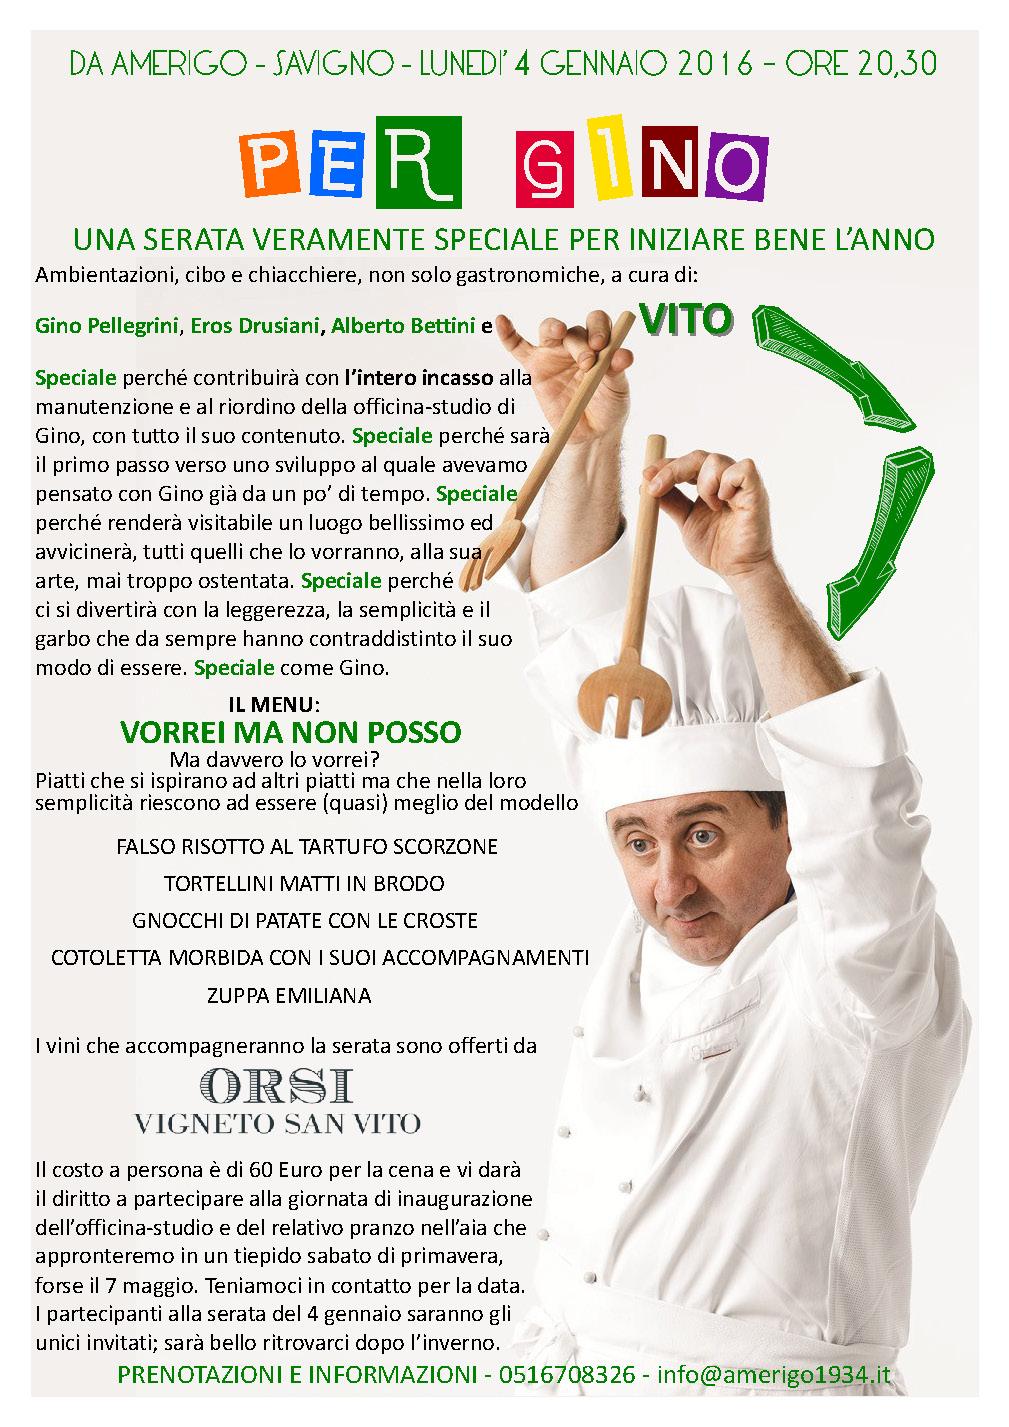 Gino Pellegrini, Amerigo, Savigno, Premiate Trattorie Italiane